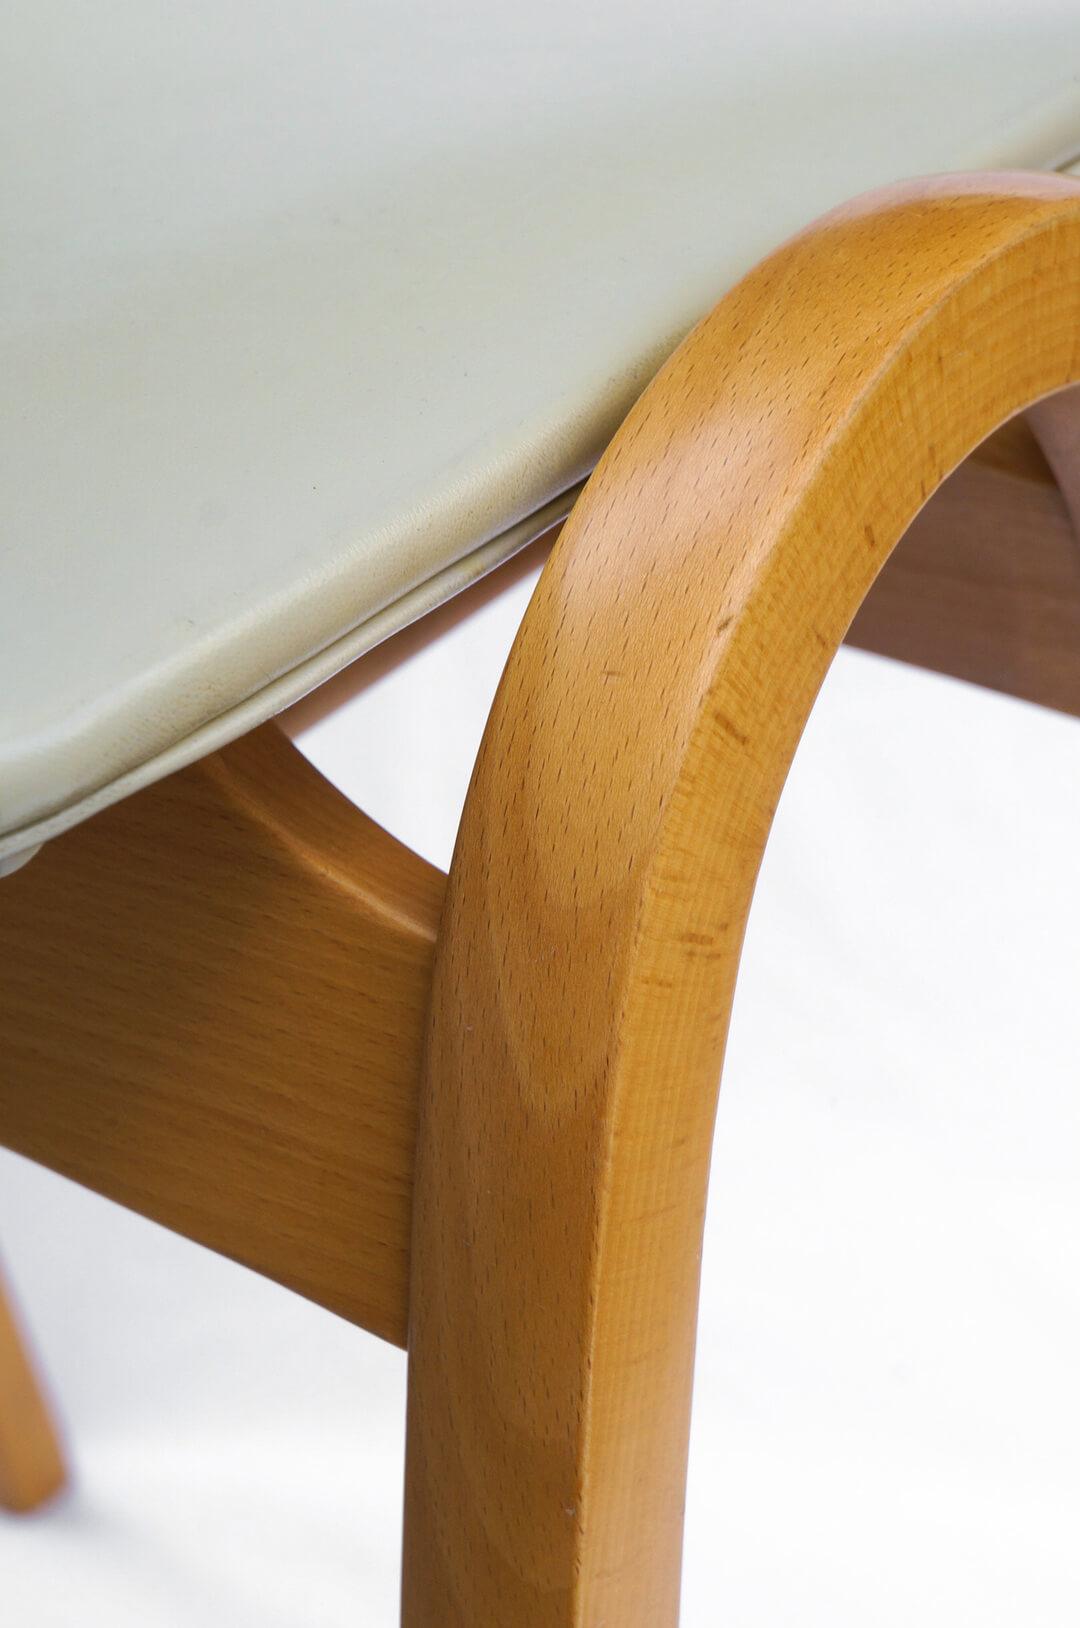 Akita Mokko Stacking Stool No.202 designed by Kenmochi Isamu/秋田木工 スタッキングスツール 剣持勇デザイン ジャパニーズモダン グレー 2